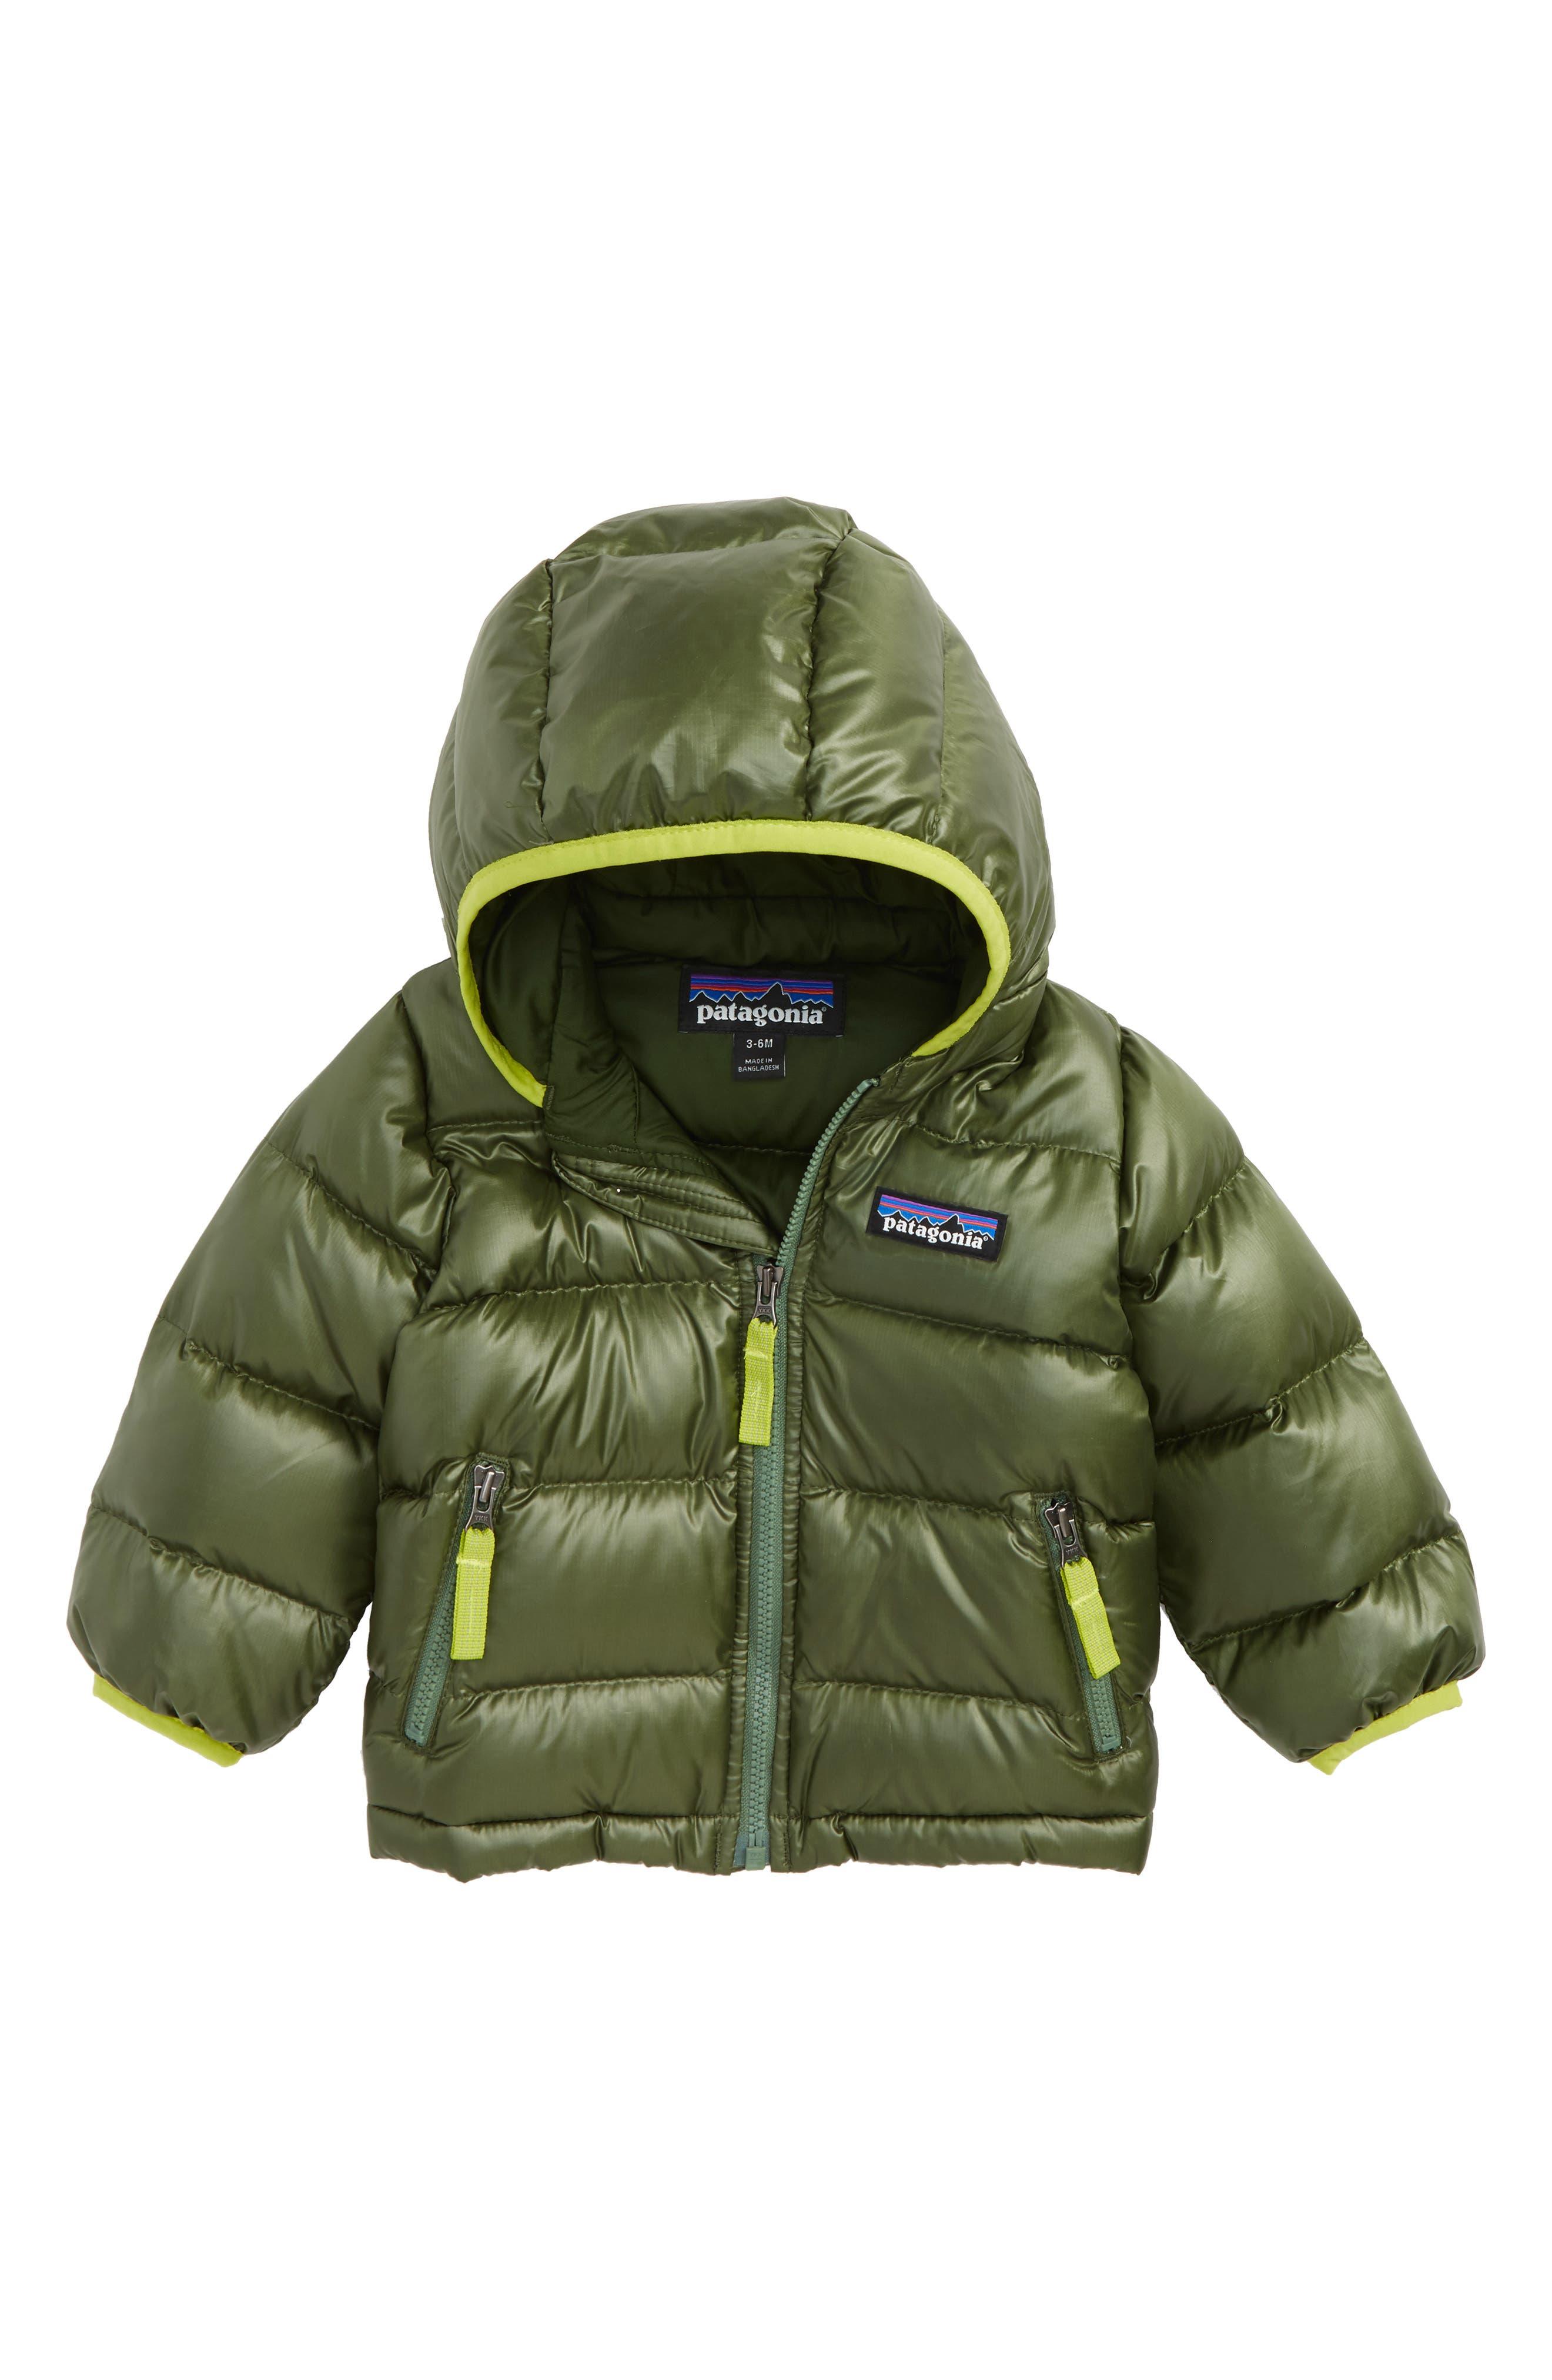 Alternate Image 1 Selected - Patagonia Hi-Loft Water-Repellent 600-Fill Power Down Sweater Hoodie (Baby Boys)